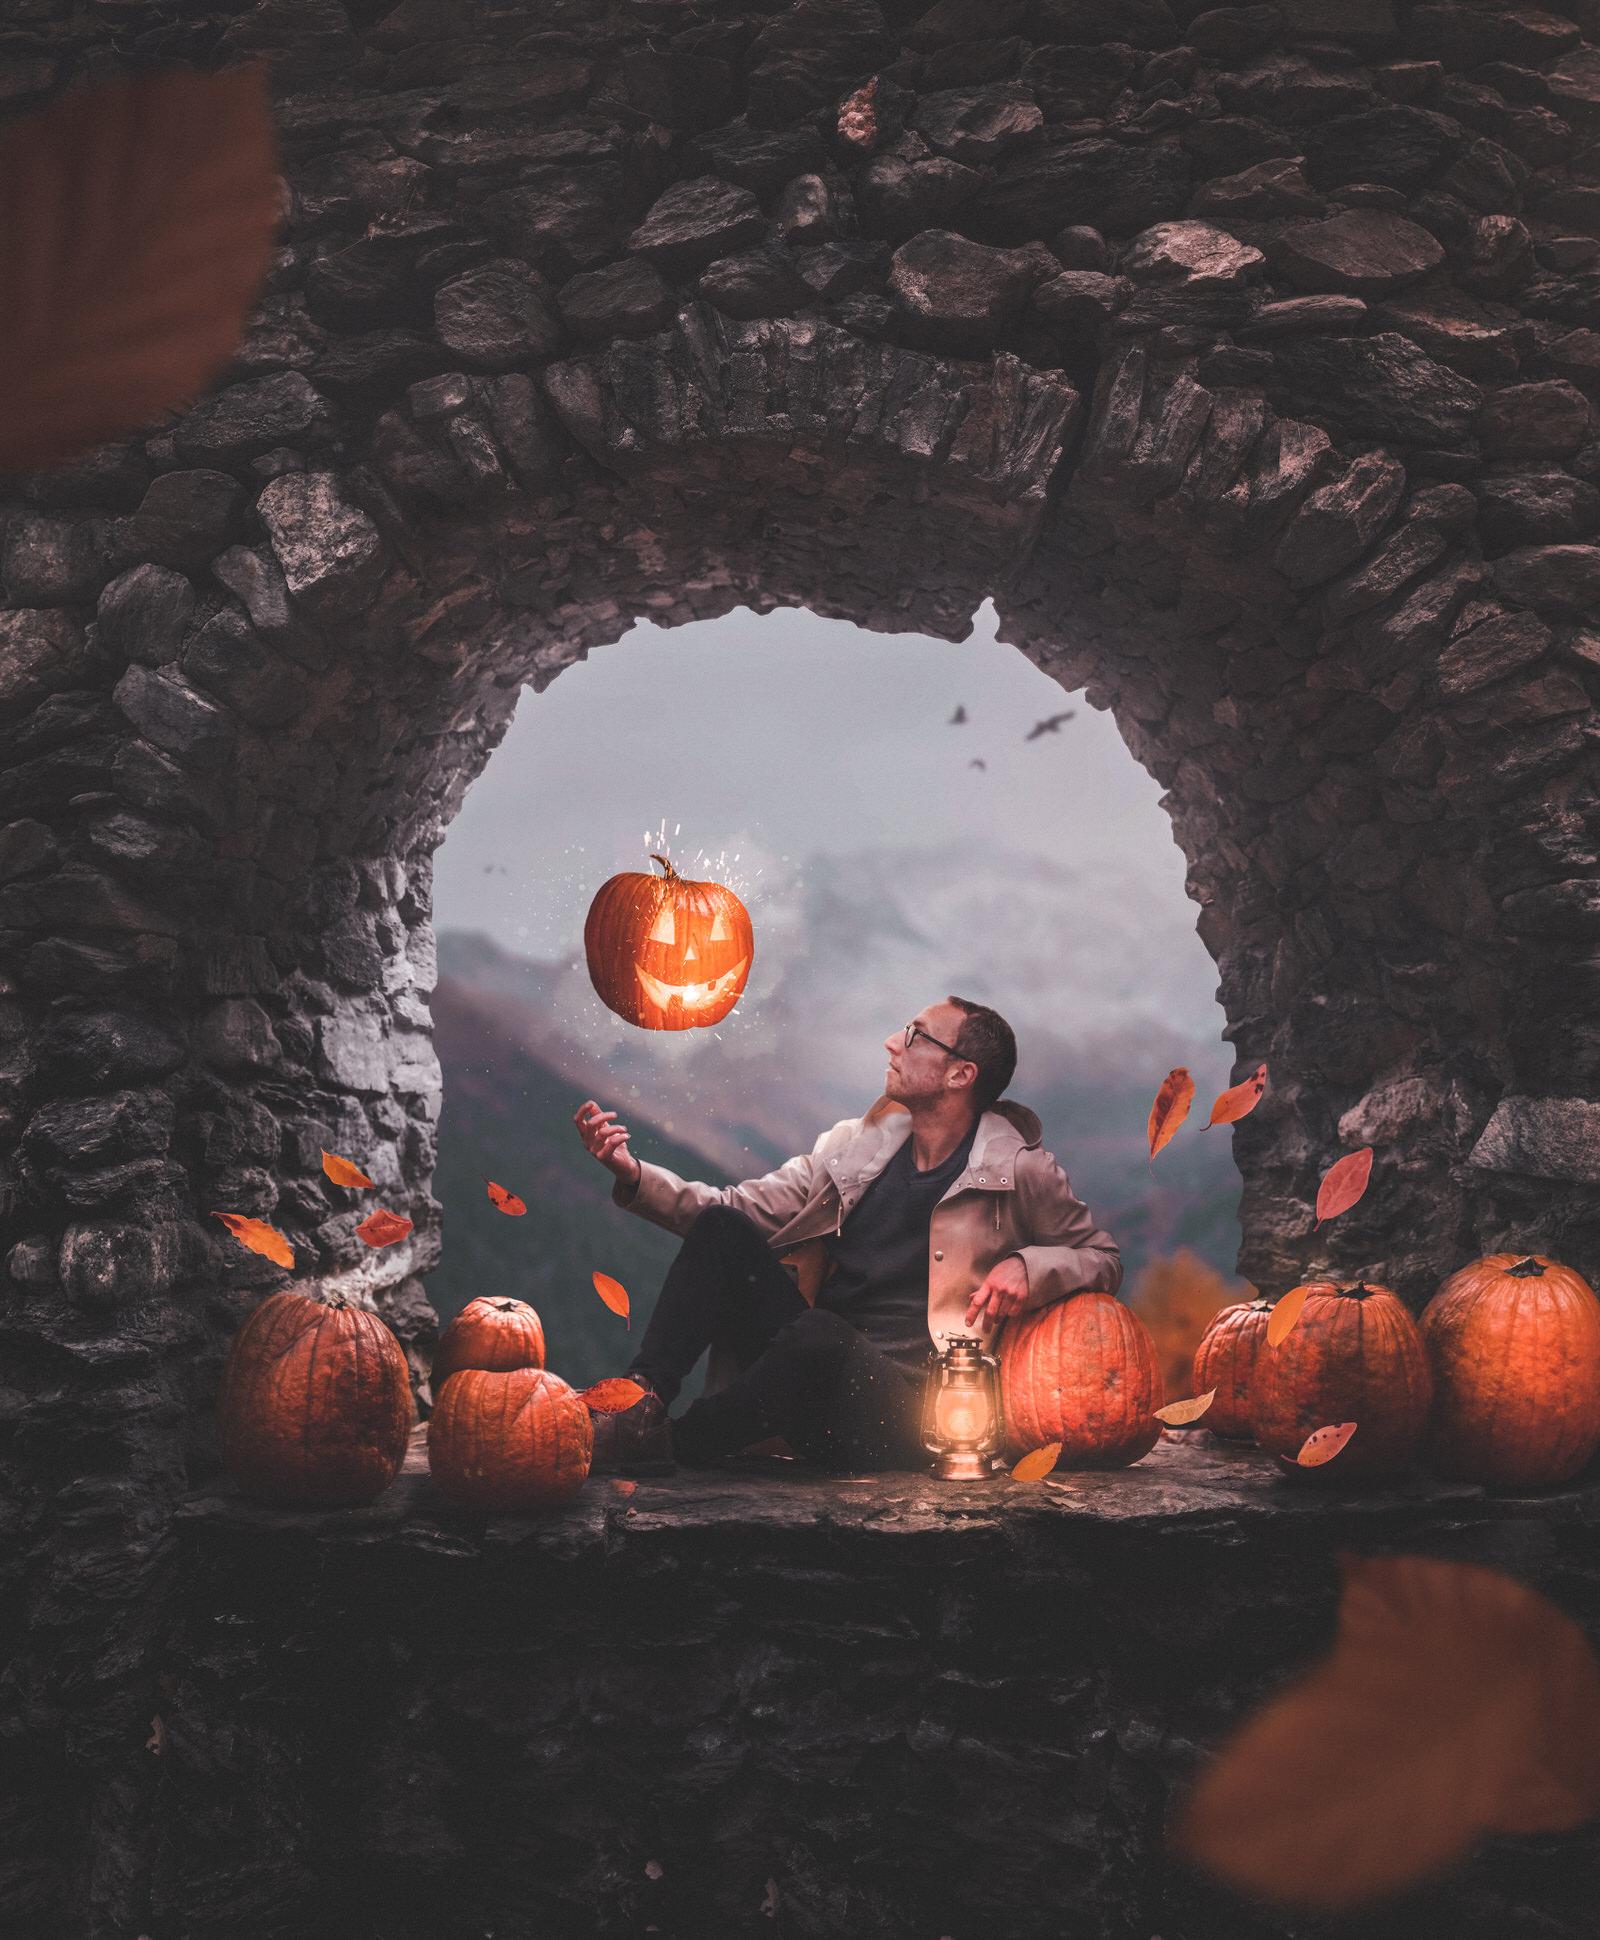 The Great Pumpkin Final Image